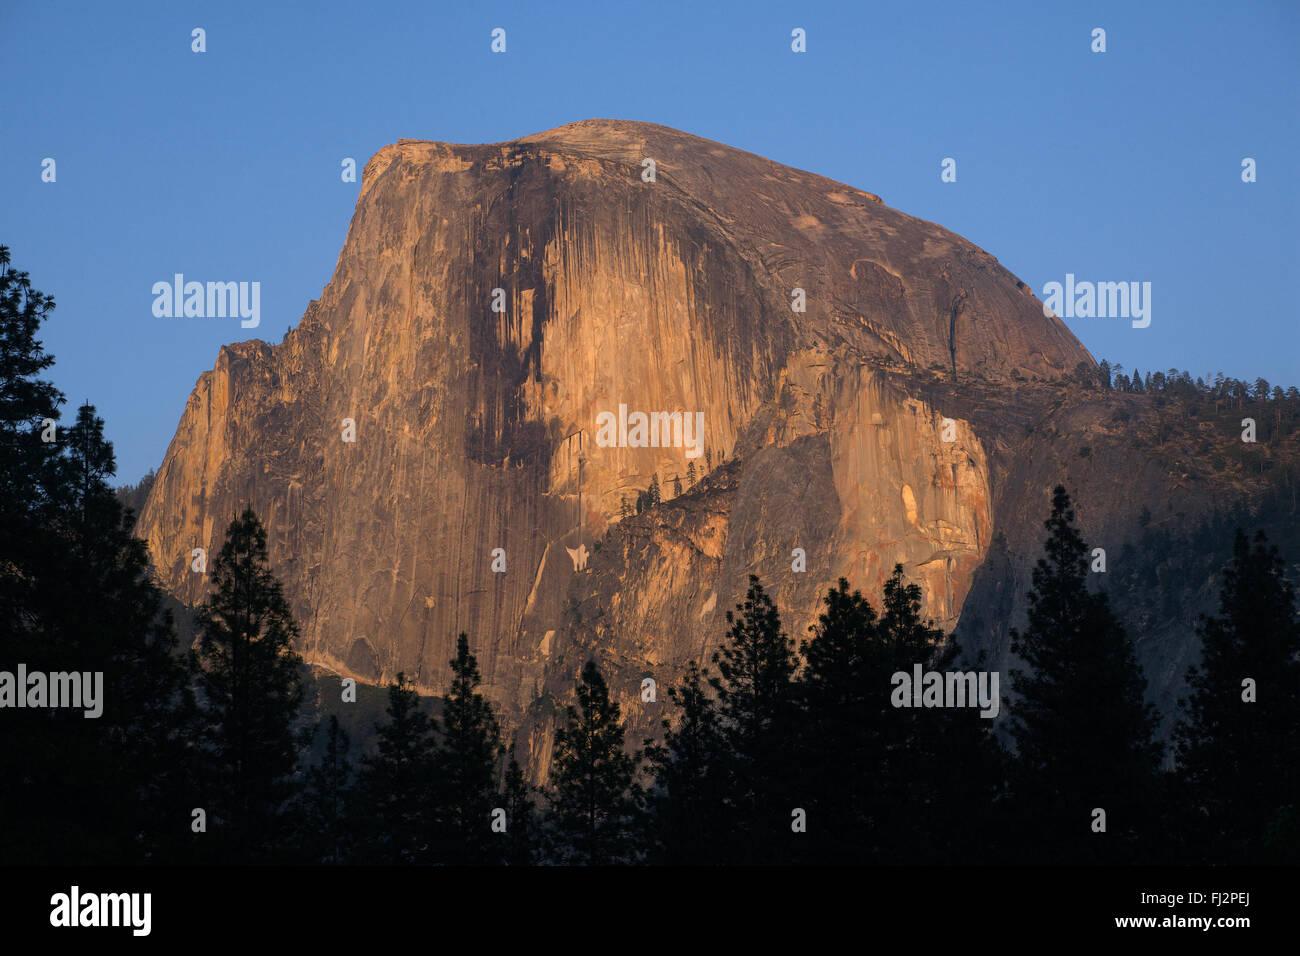 HALF DOME glows warmly at sunset - YOSEMITE NATIONAL PARK, CALIFORNIA - Stock Image